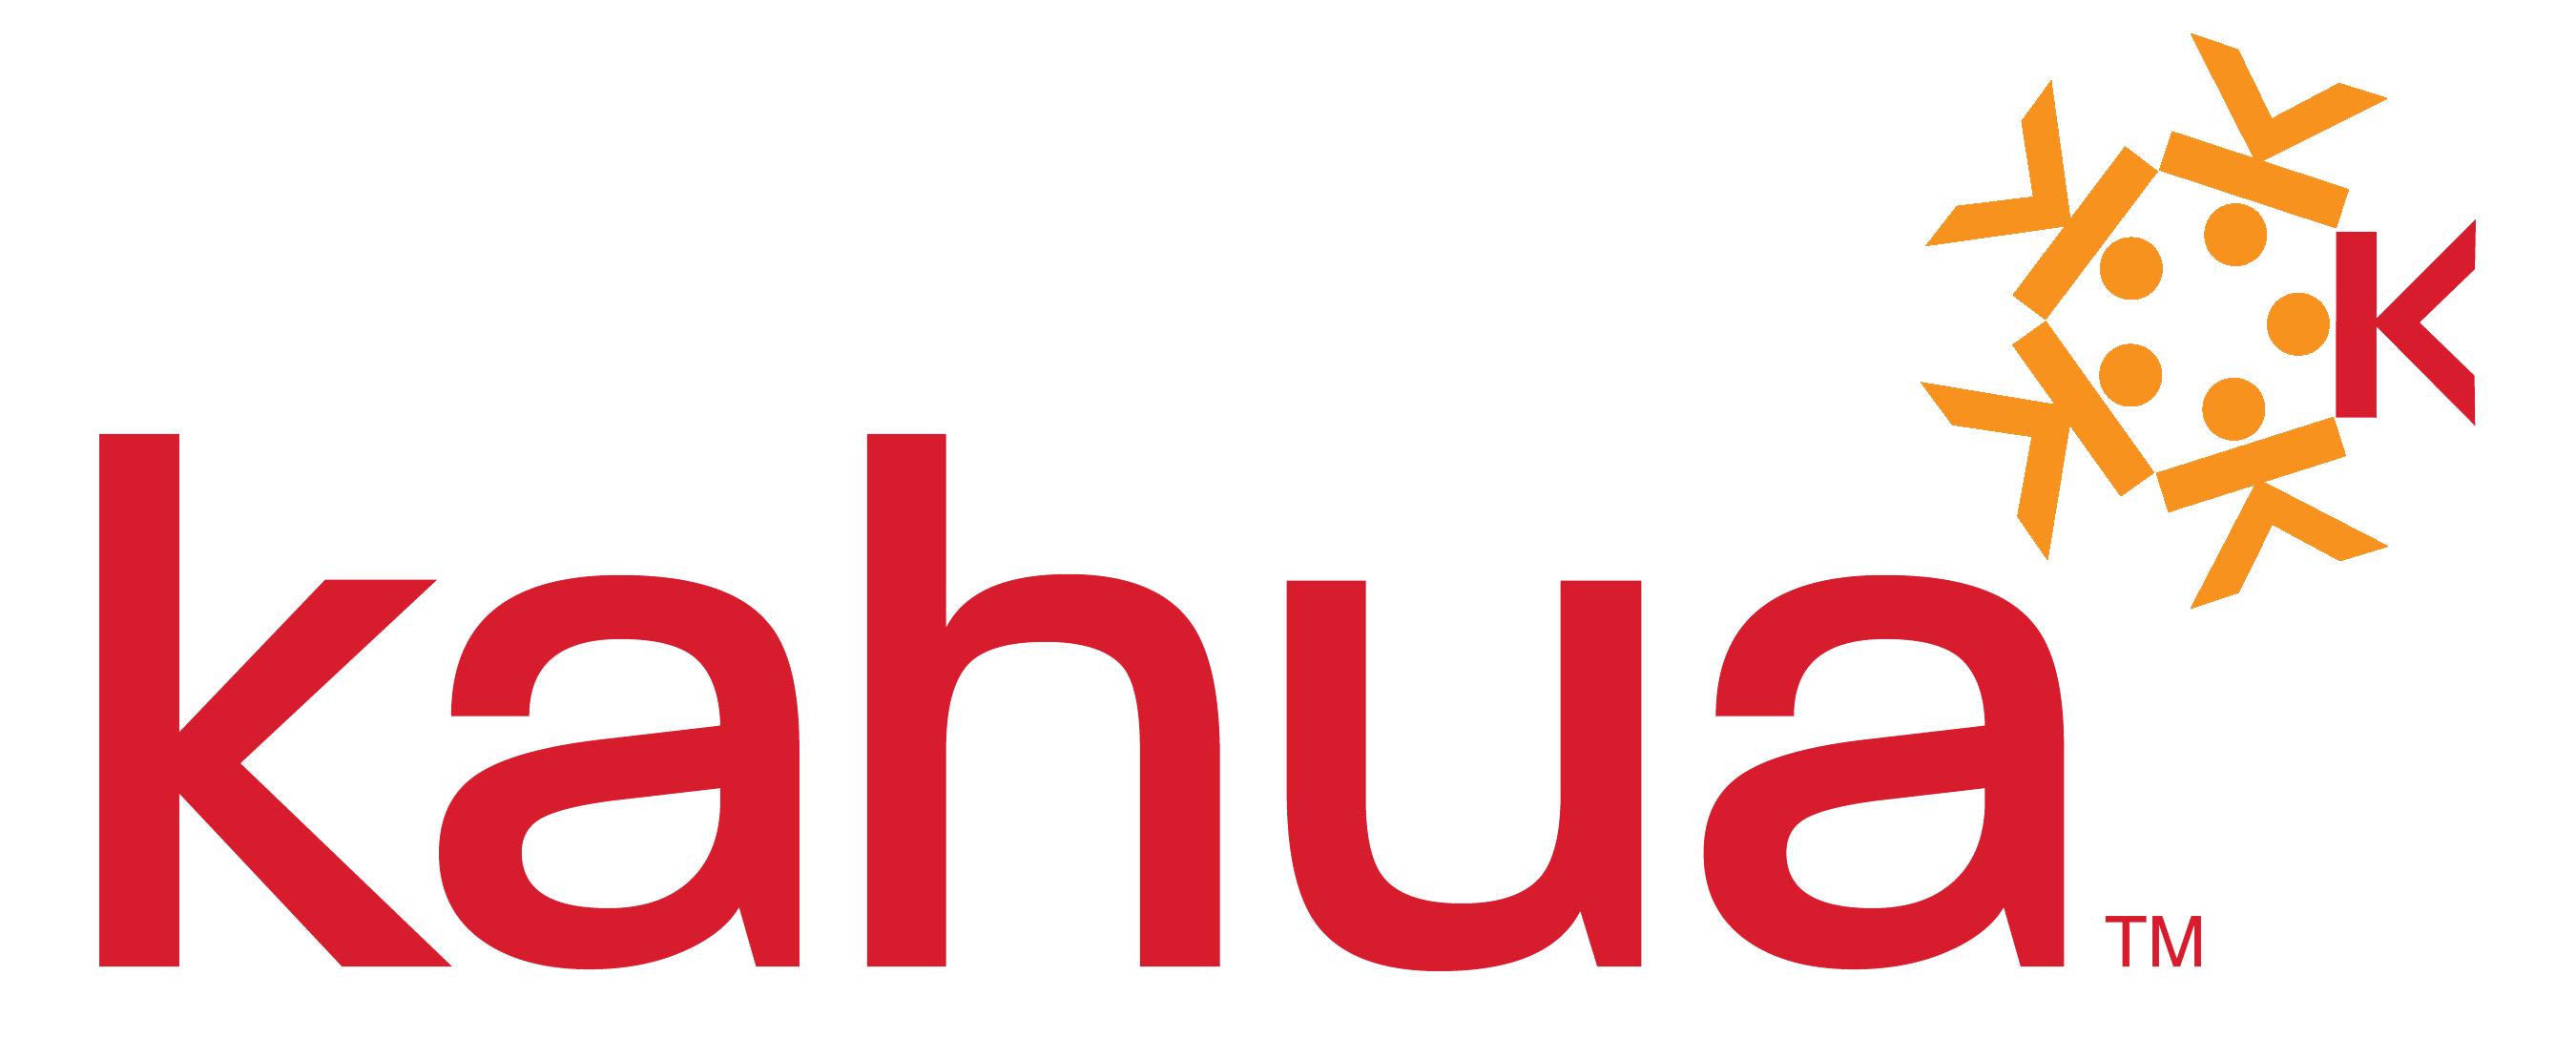 ILS Kahua logo 2017 Glowing v2.png